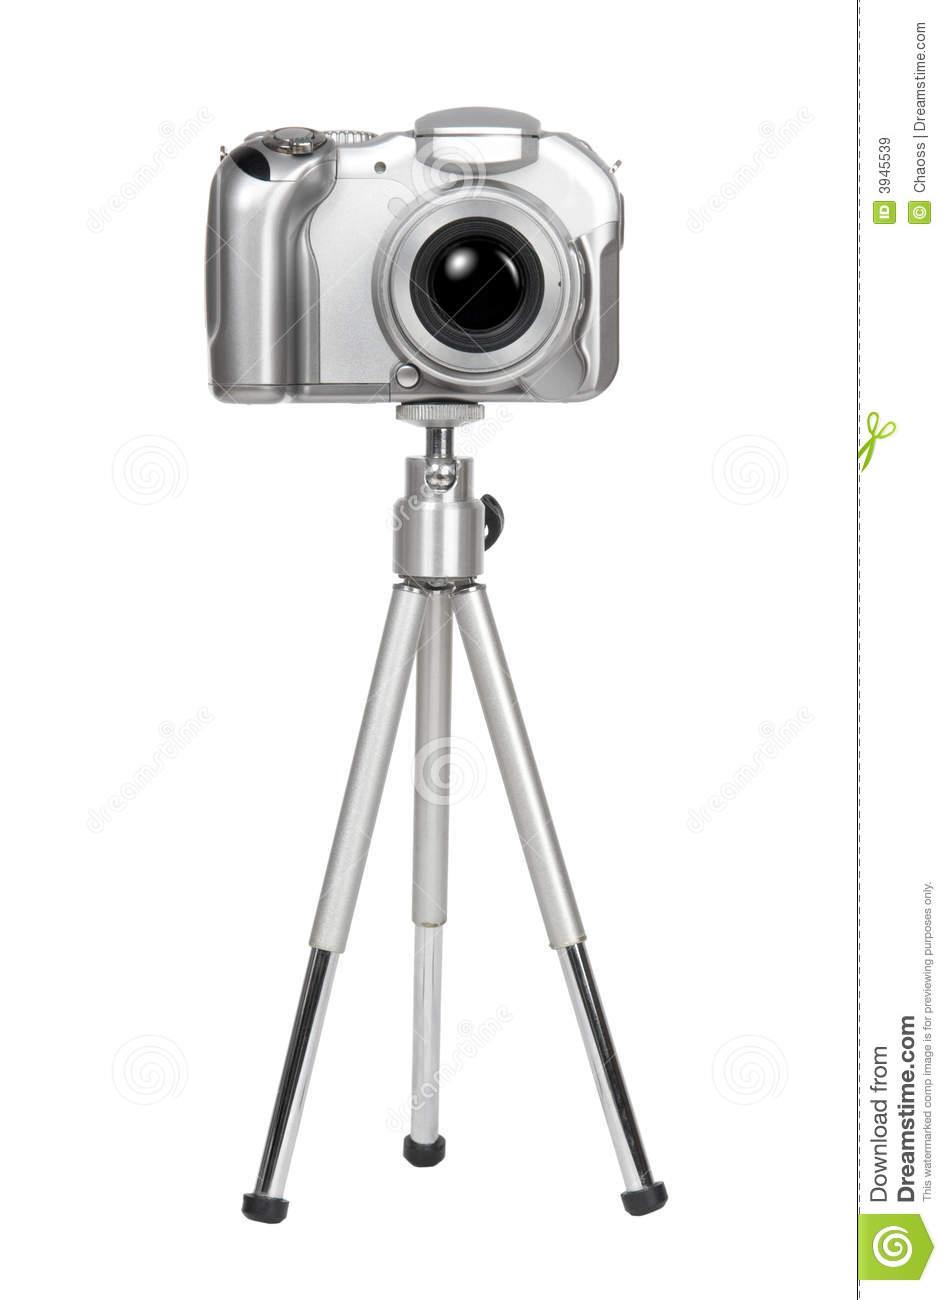 Camera on tripod clipart.